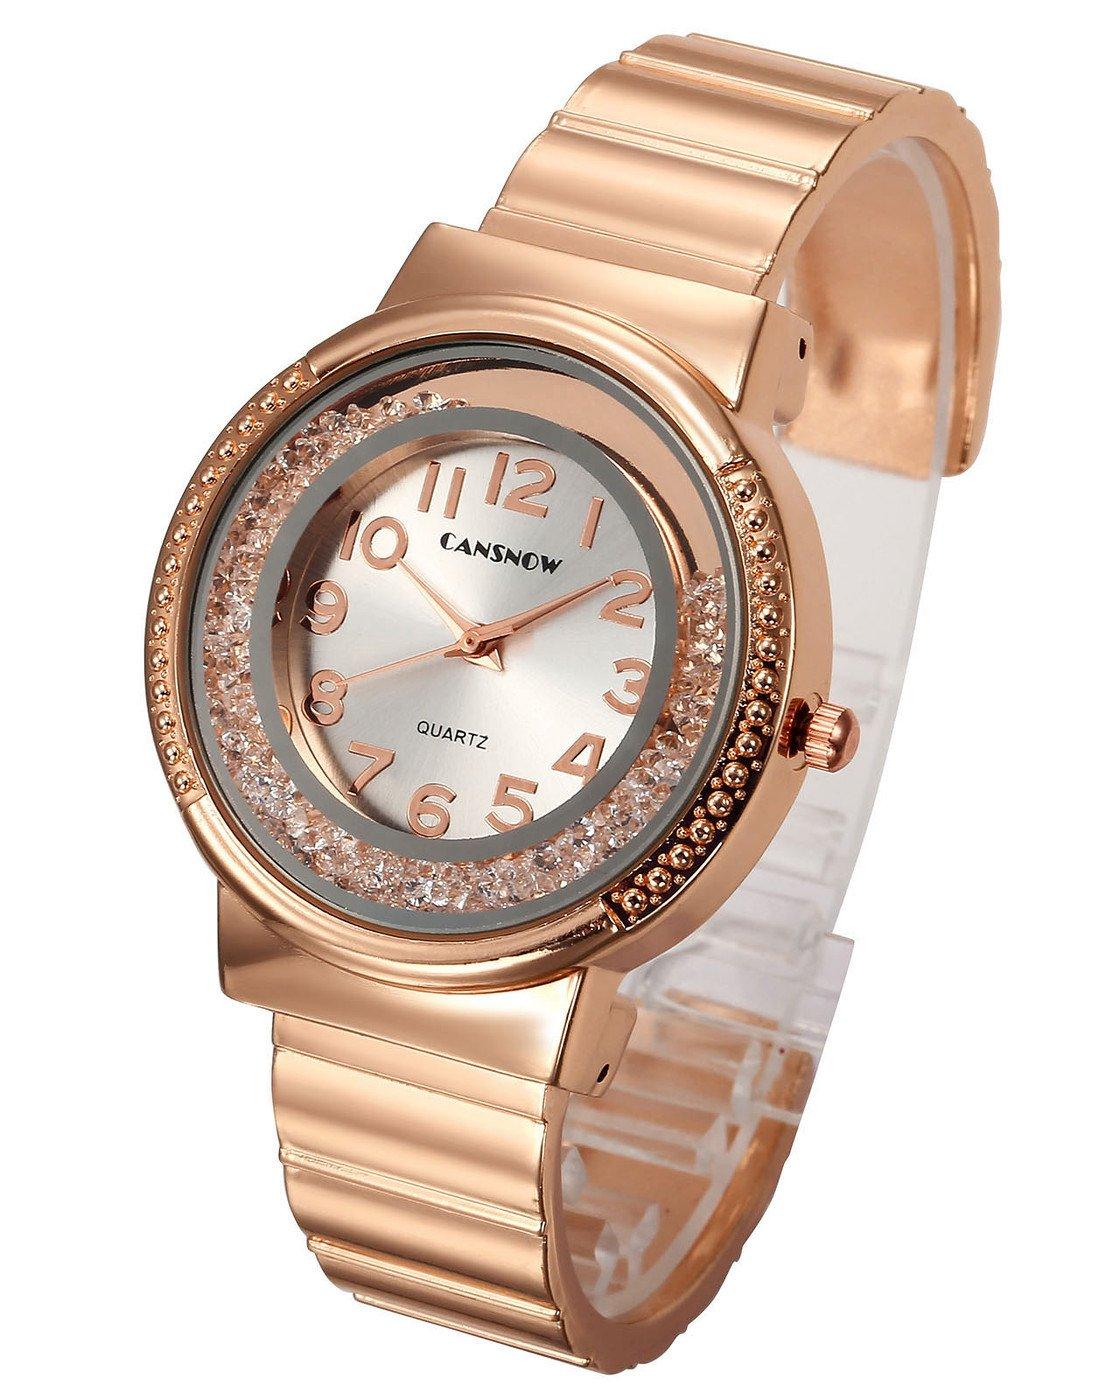 Top Plaza Women Ladies Casual Luxury Gold Silver Rose Gold Tone Alloy Analog Quartz Bracelet Watch Round Case Rhinestones Decorated Elegant Dress Bangle Cuff Wristwatch-Rose Gold #1